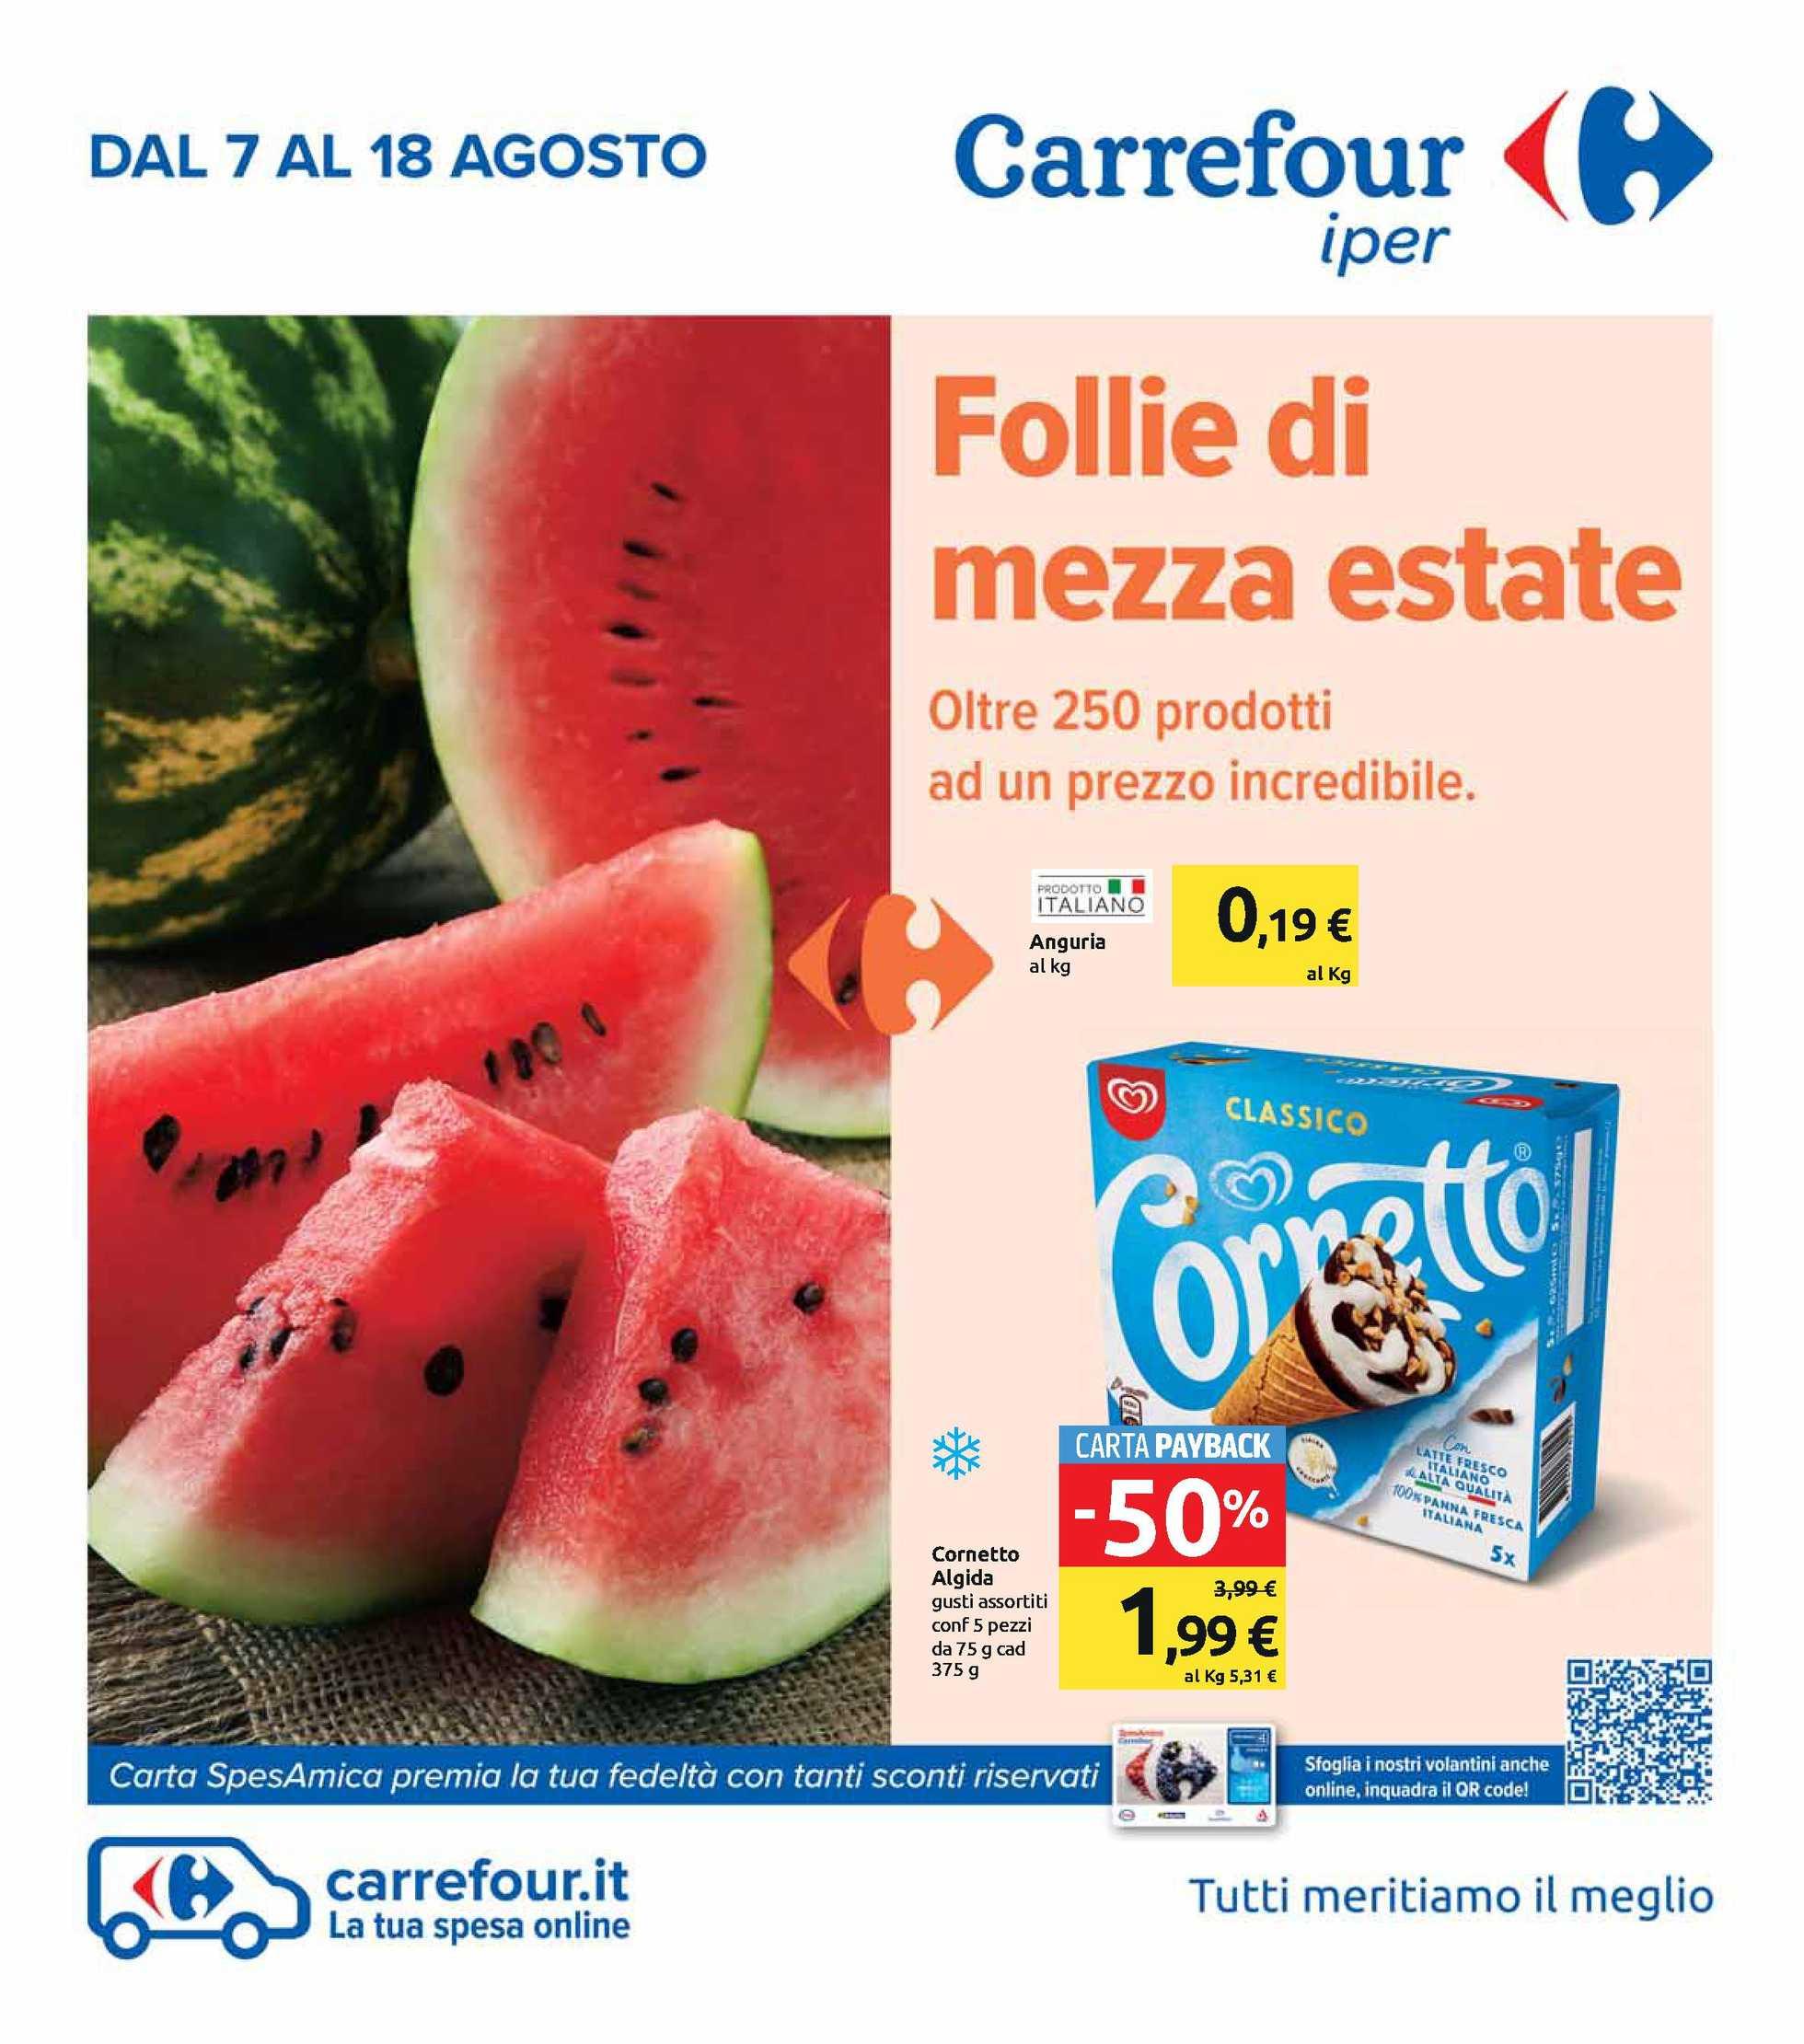 Carrefour Iper - offerte valide dal 07.08.2020 al 18.08.2020 - pagina 1.